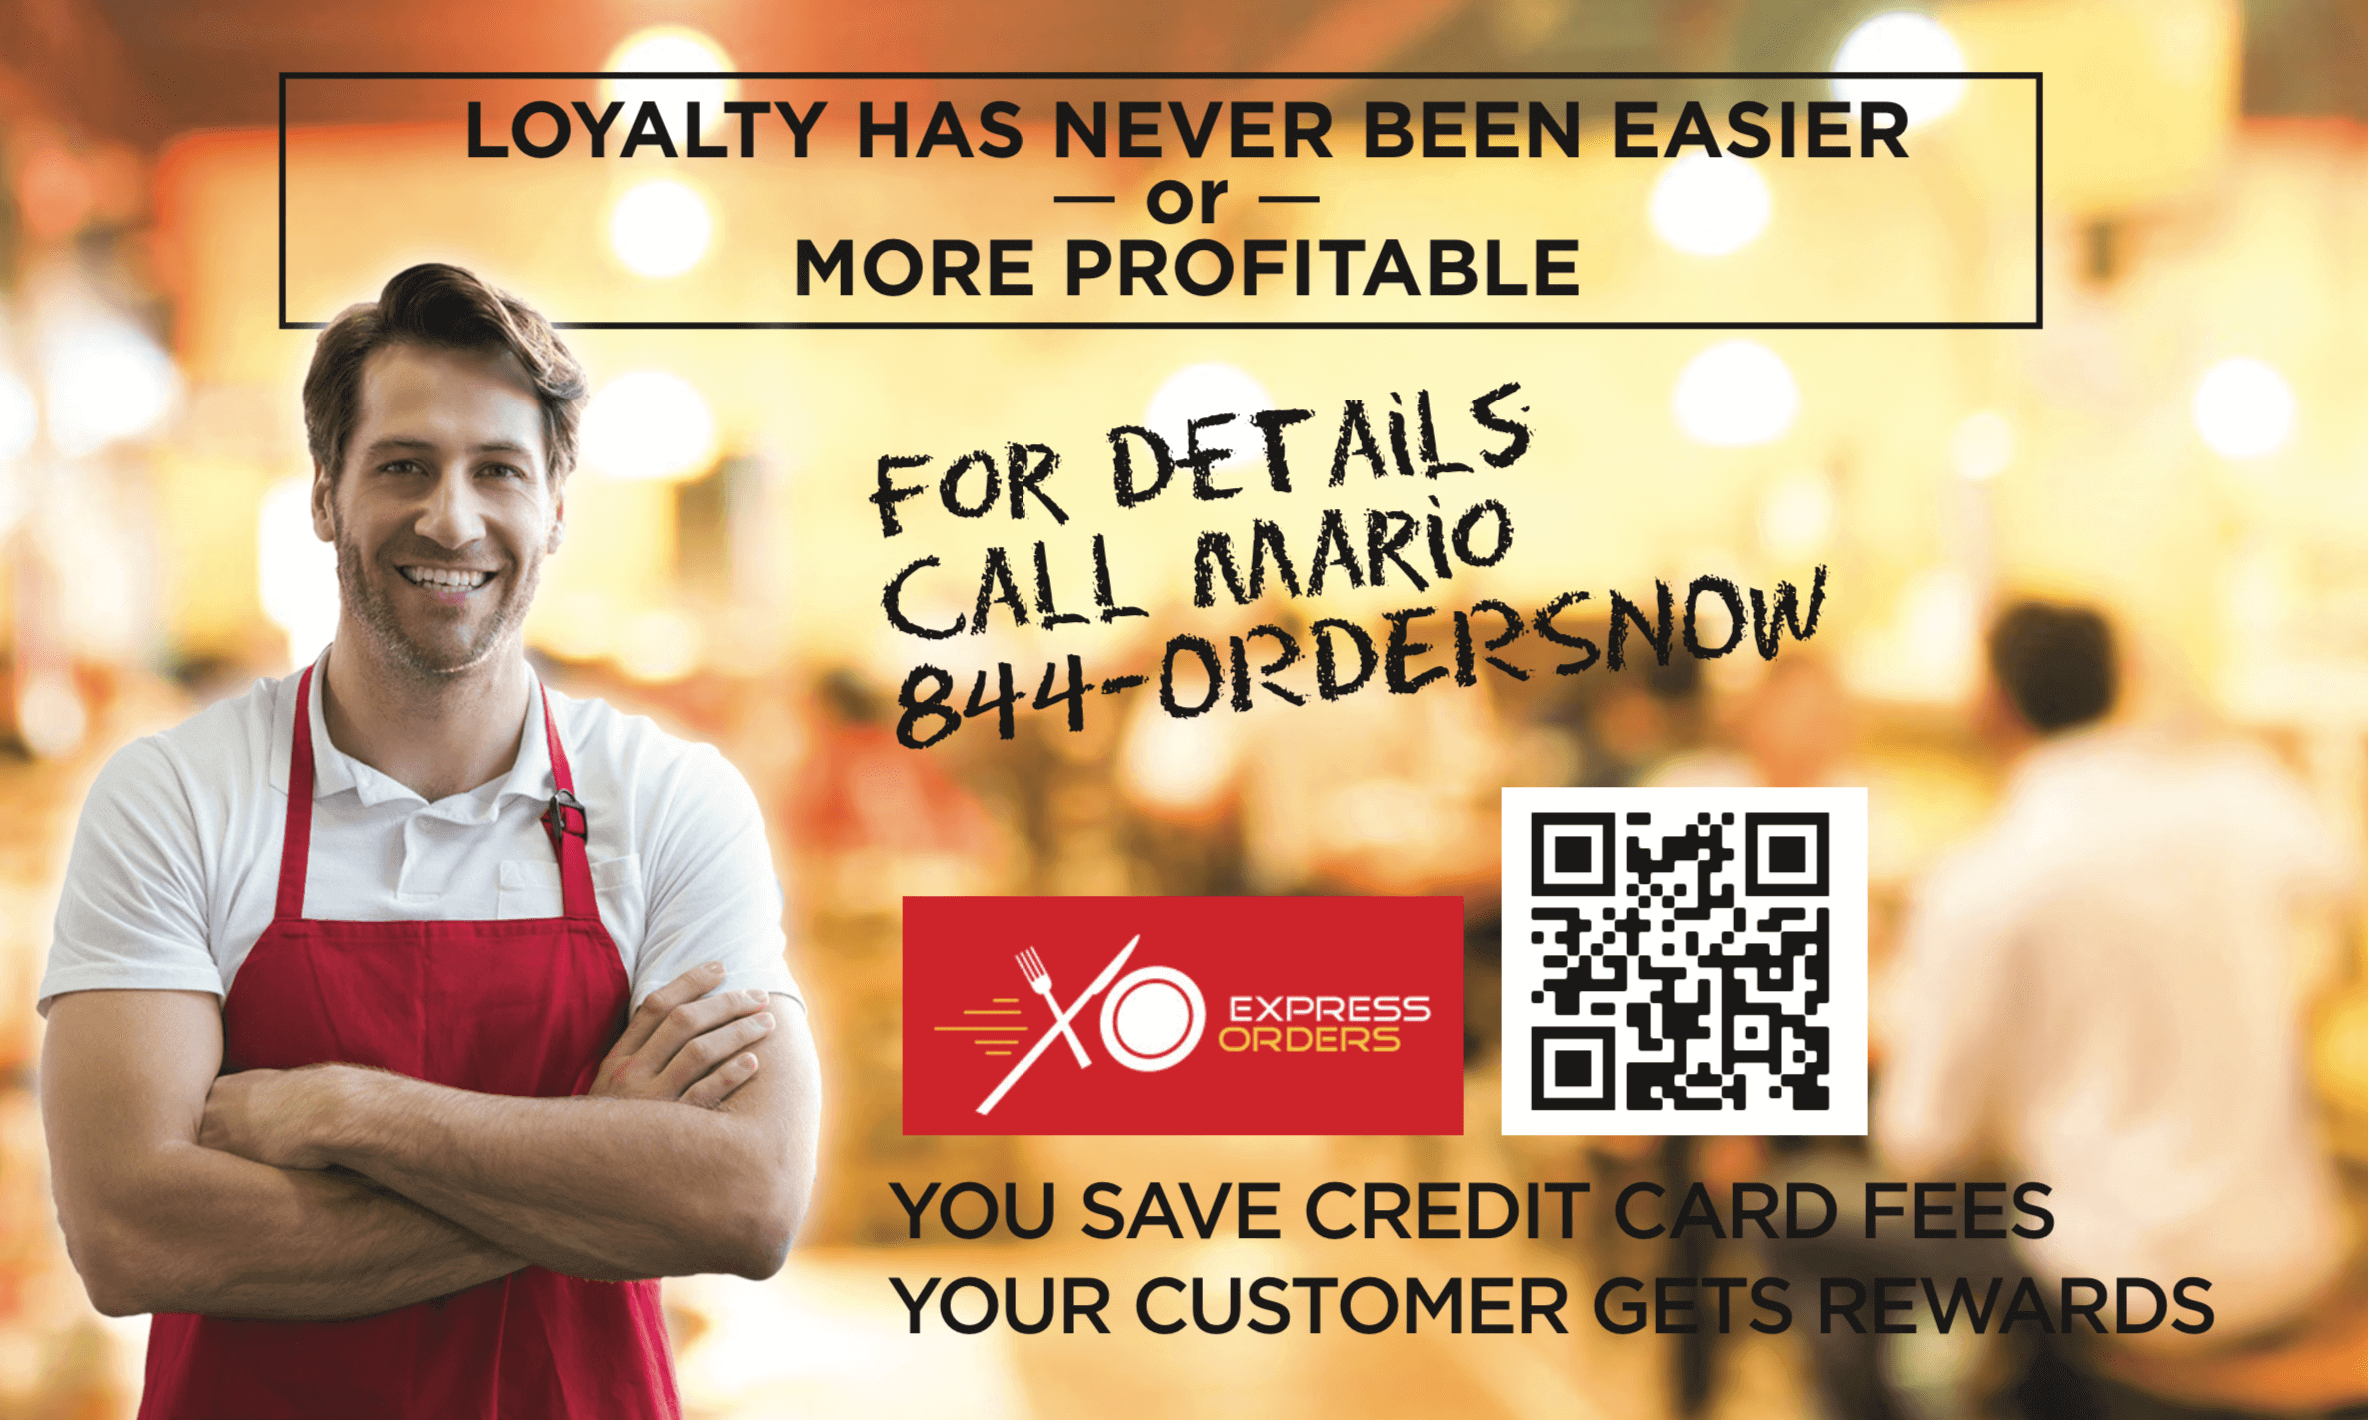 Restaurant Rewards Express Orders